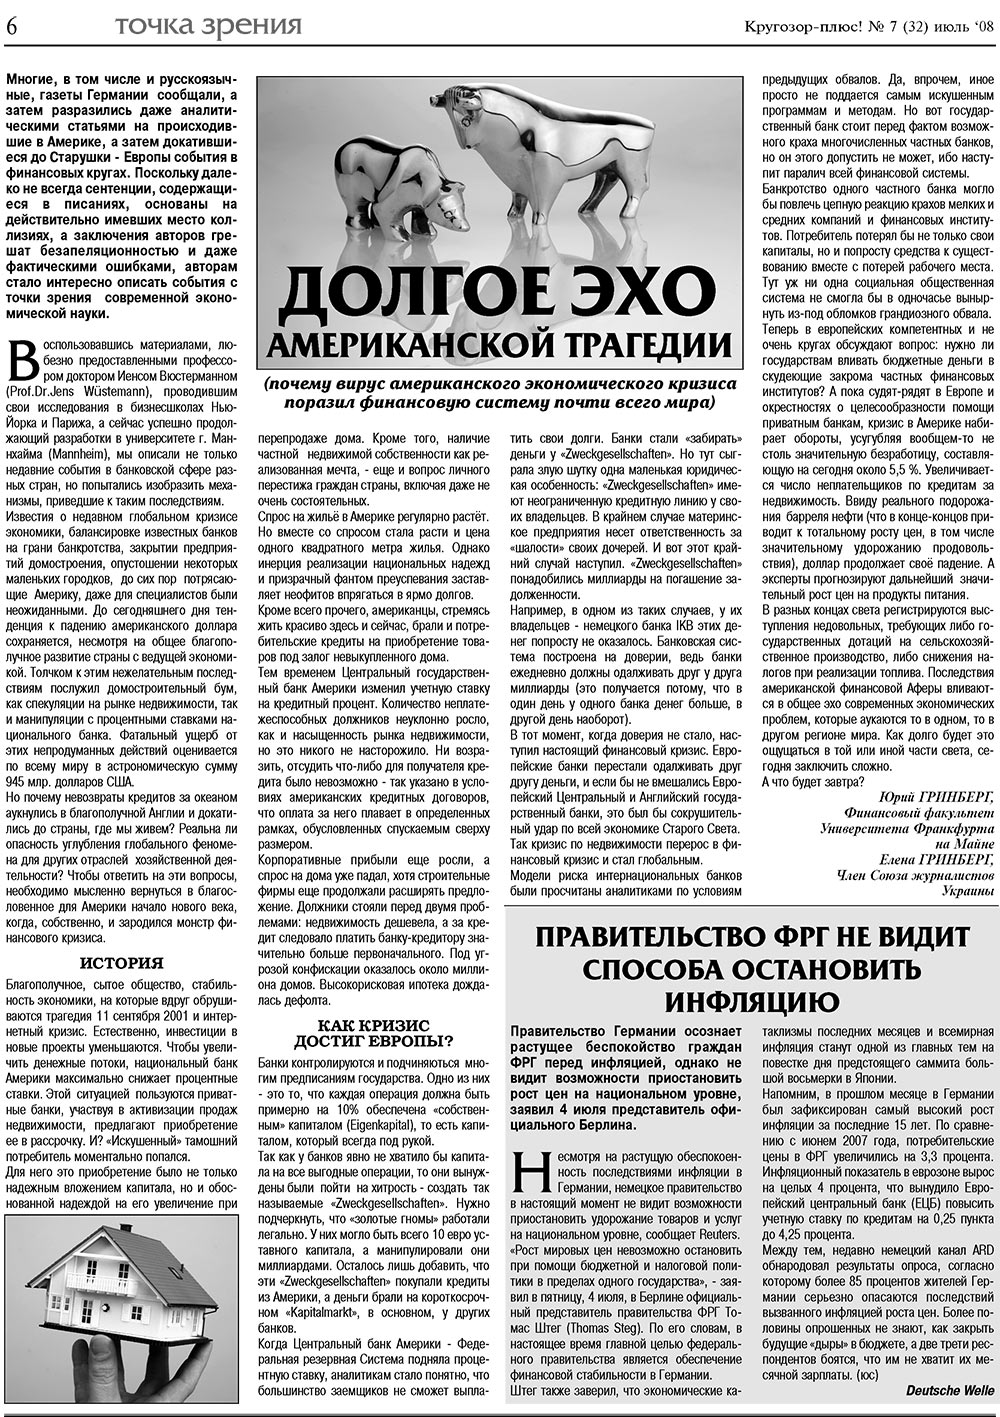 Кругозор плюс! (газета). 2008 год, номер 7, стр. 6